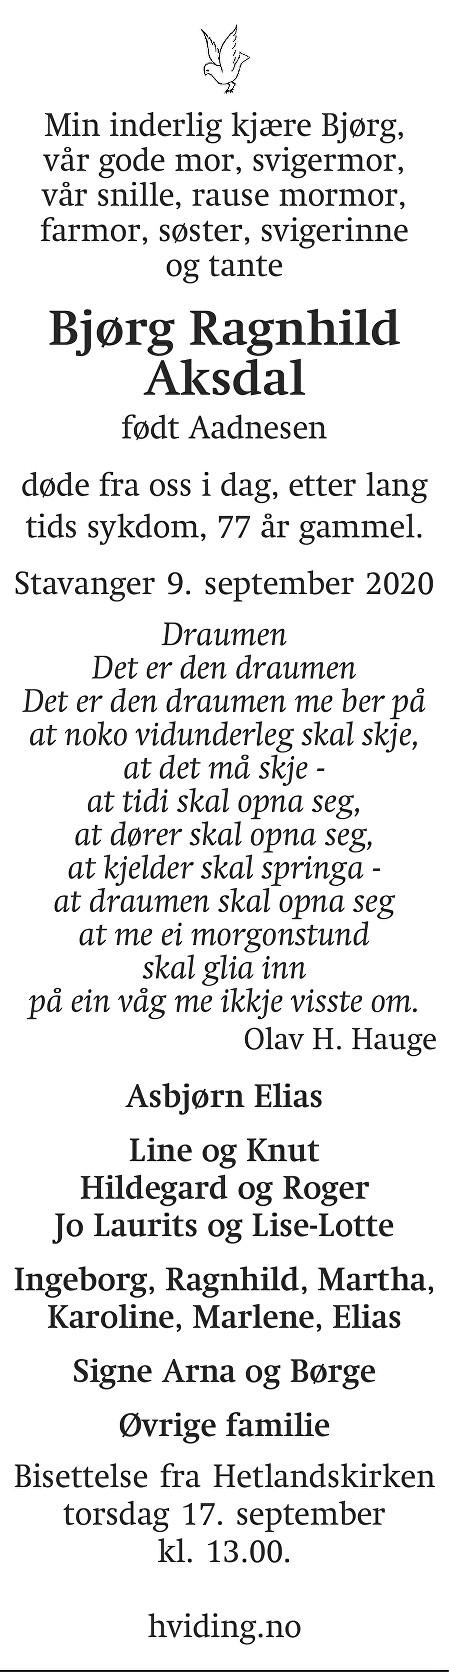 Bjørg Ragnhild Aksdal Dødsannonse